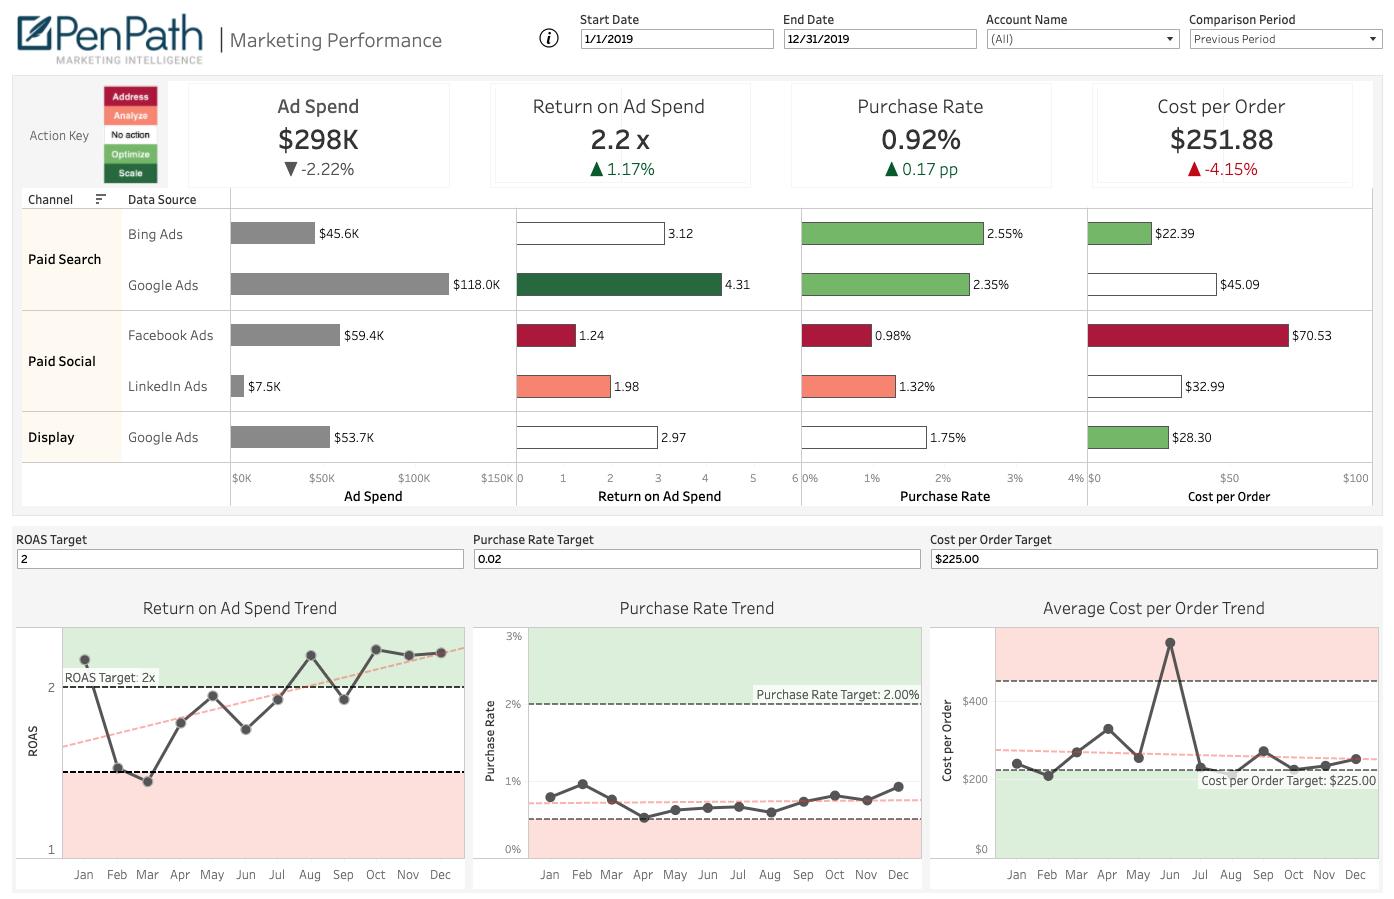 Business Intelligence Marketing Dashboard Example